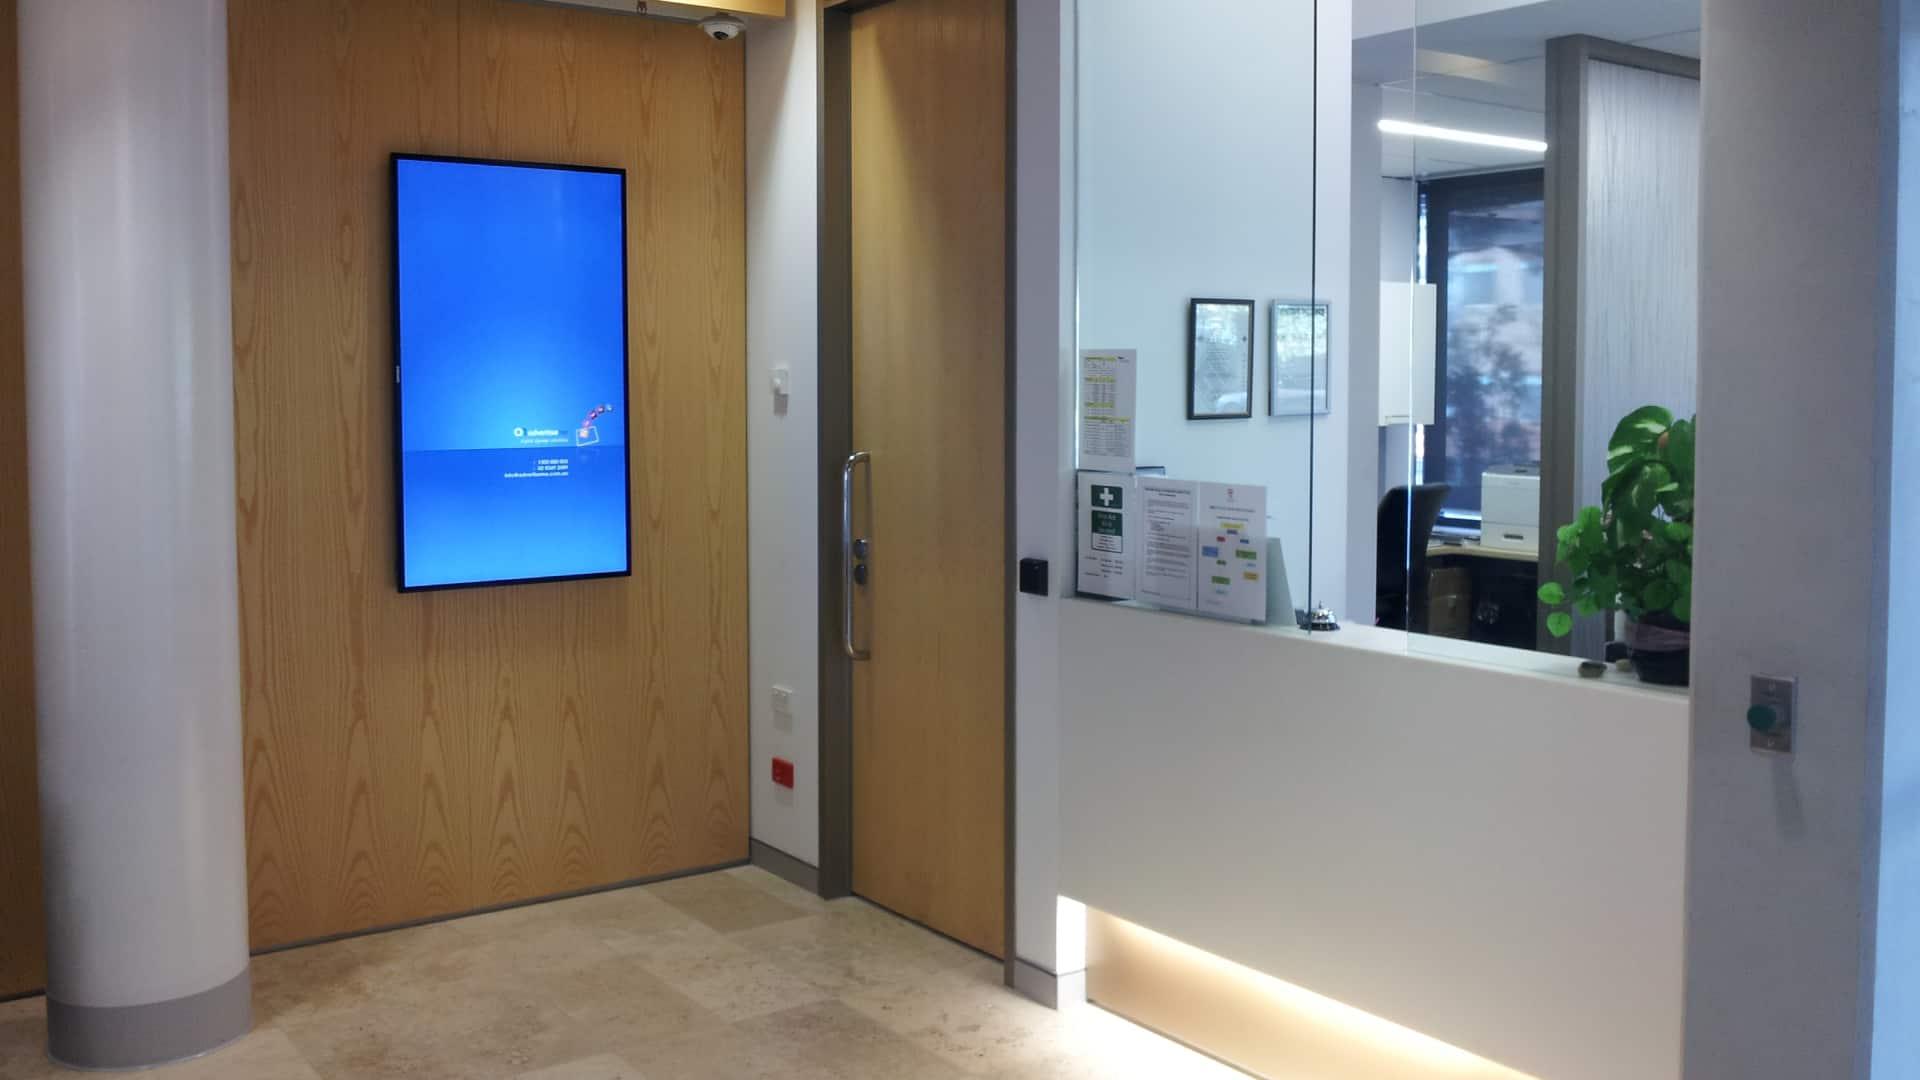 Digital Signage – Ingham Institute Welcome Boards